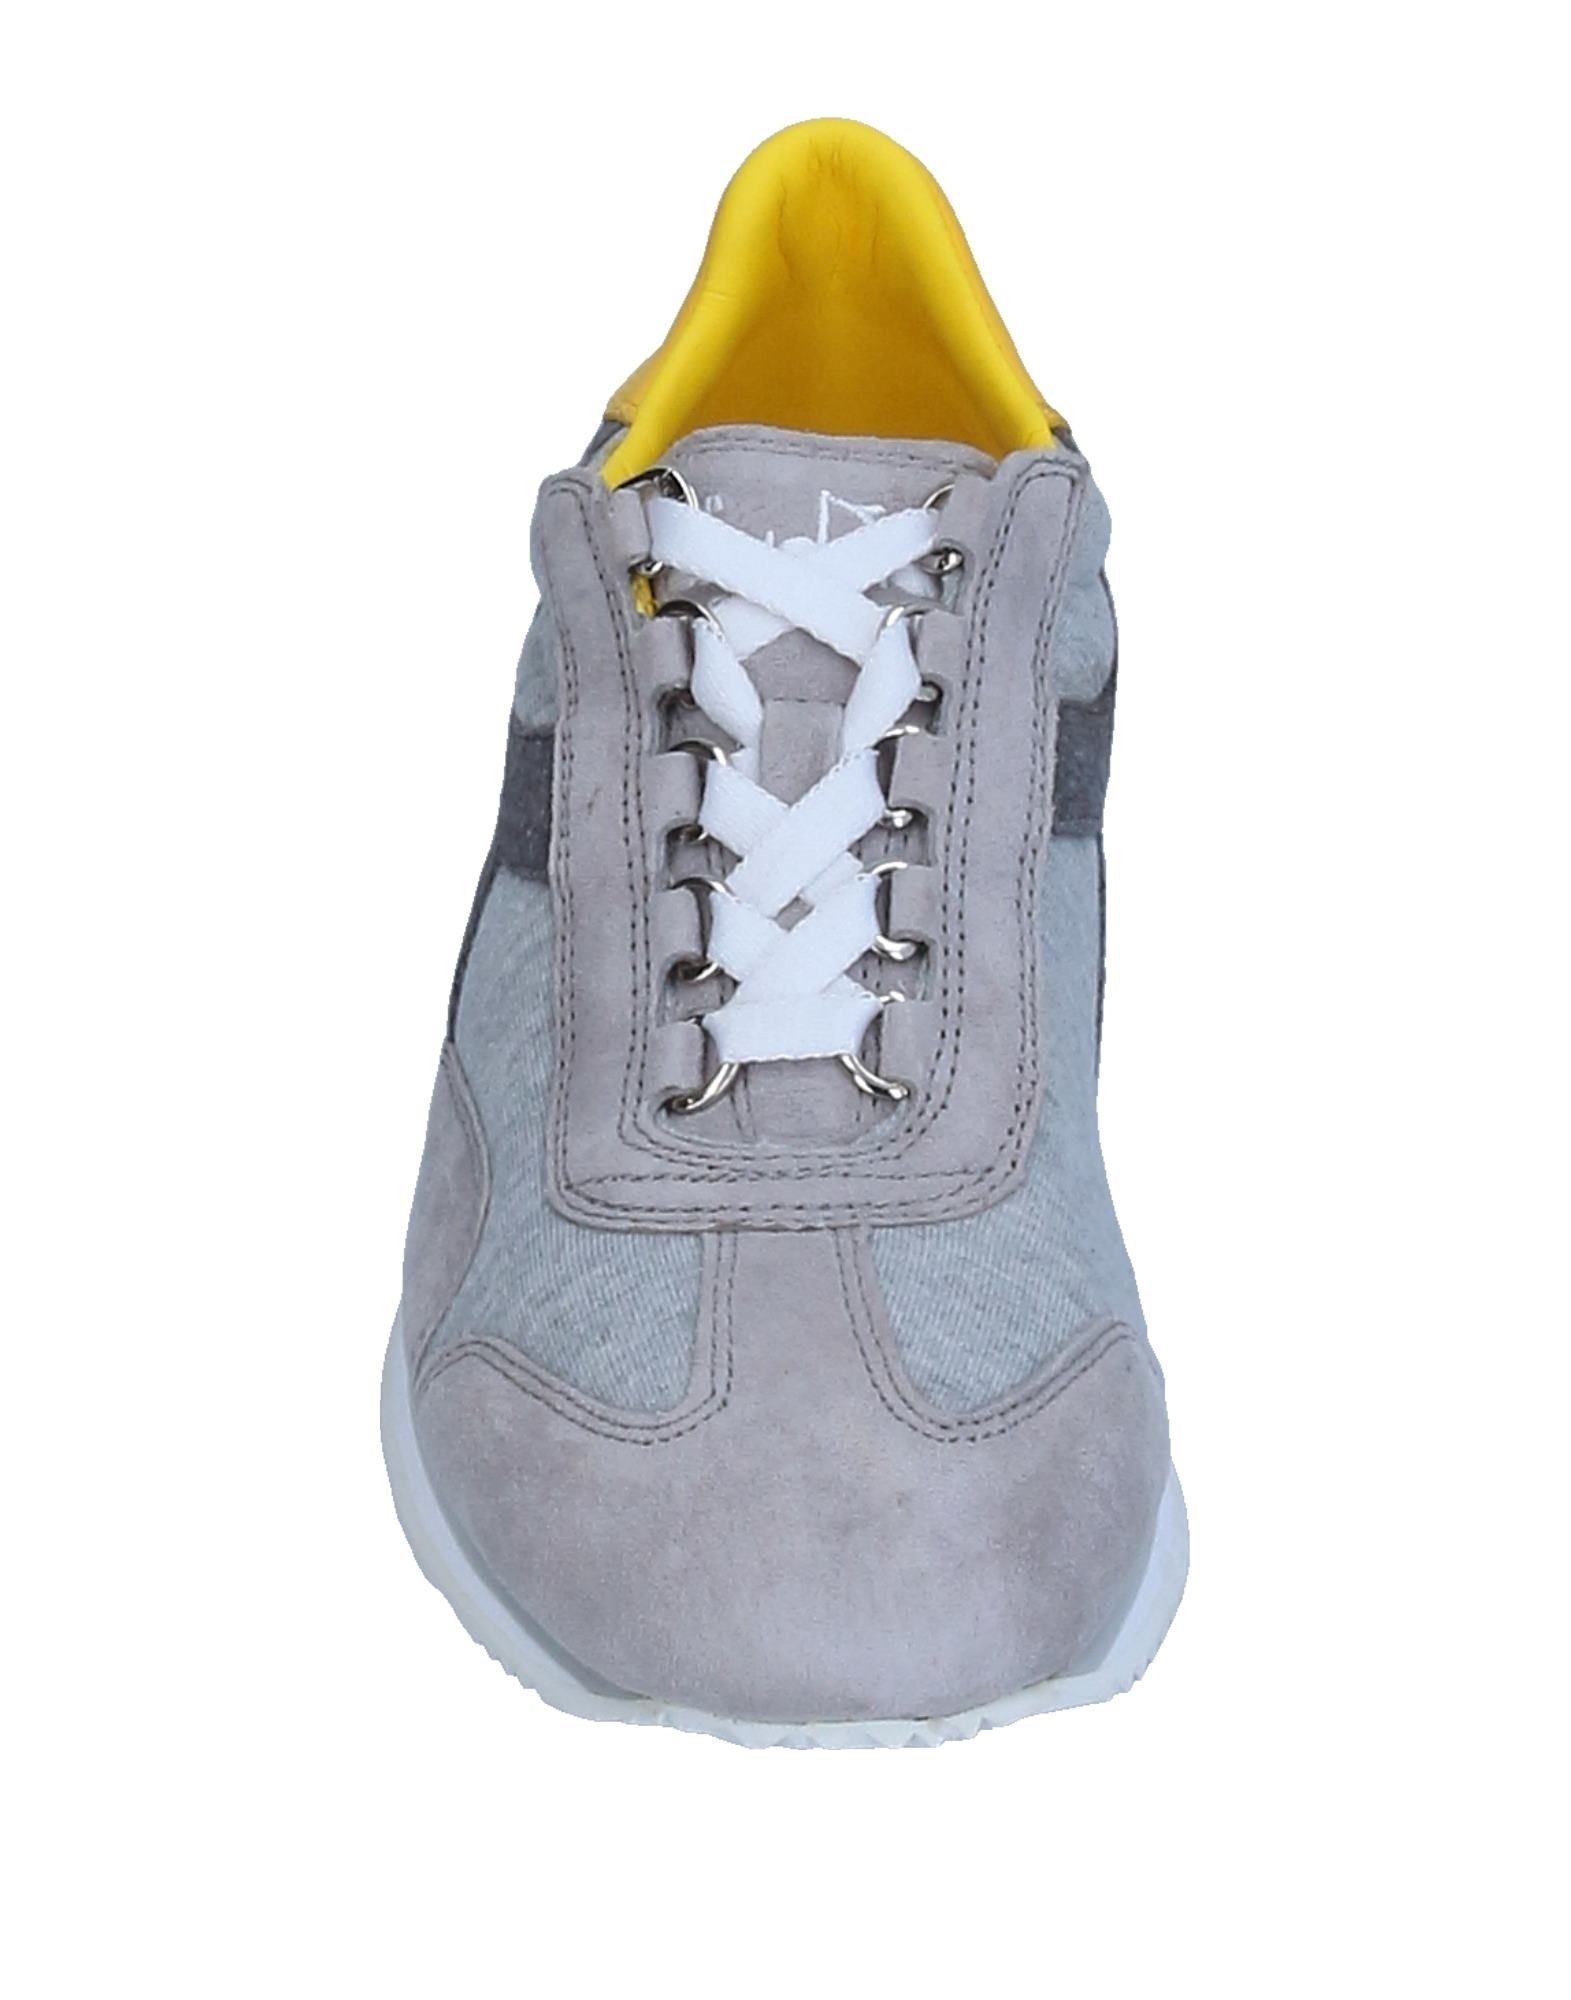 Diadora Heritage Turnschuhes Damen 11349310CH beliebte Gute Qualität beliebte 11349310CH Schuhe 22edde